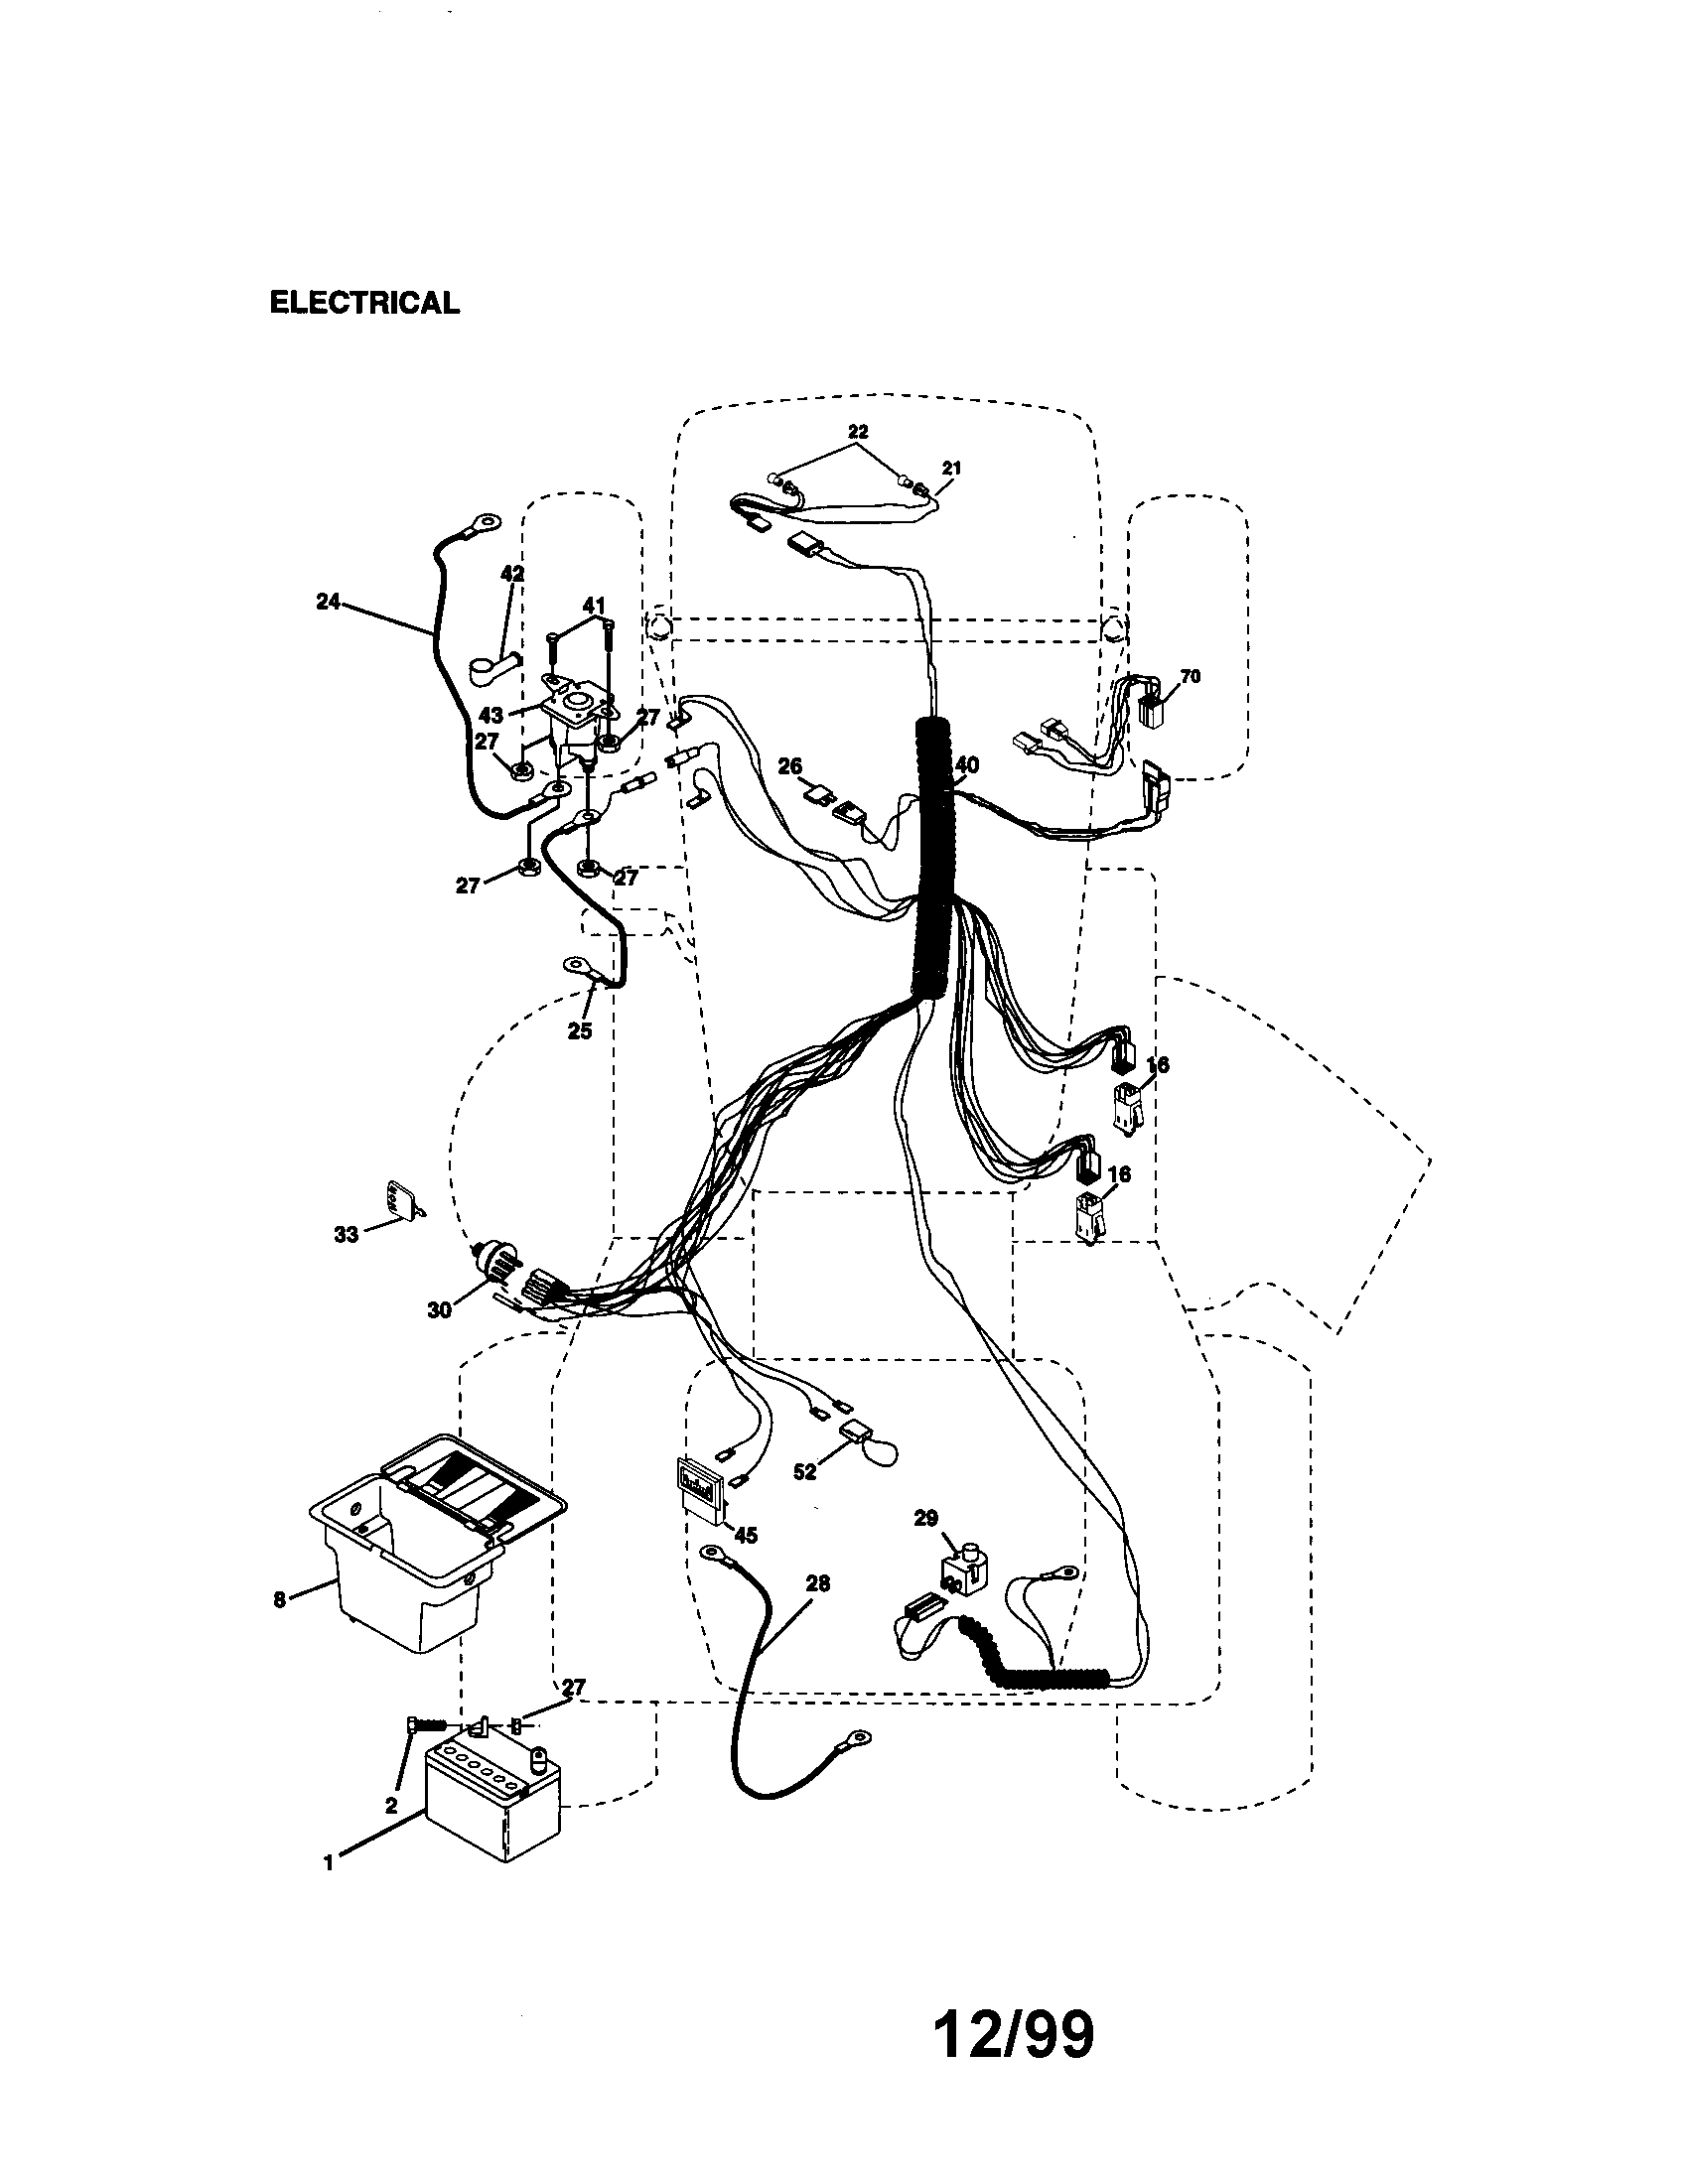 Outstanding craftsman lt 1000 wiring diagram elaboration wiring